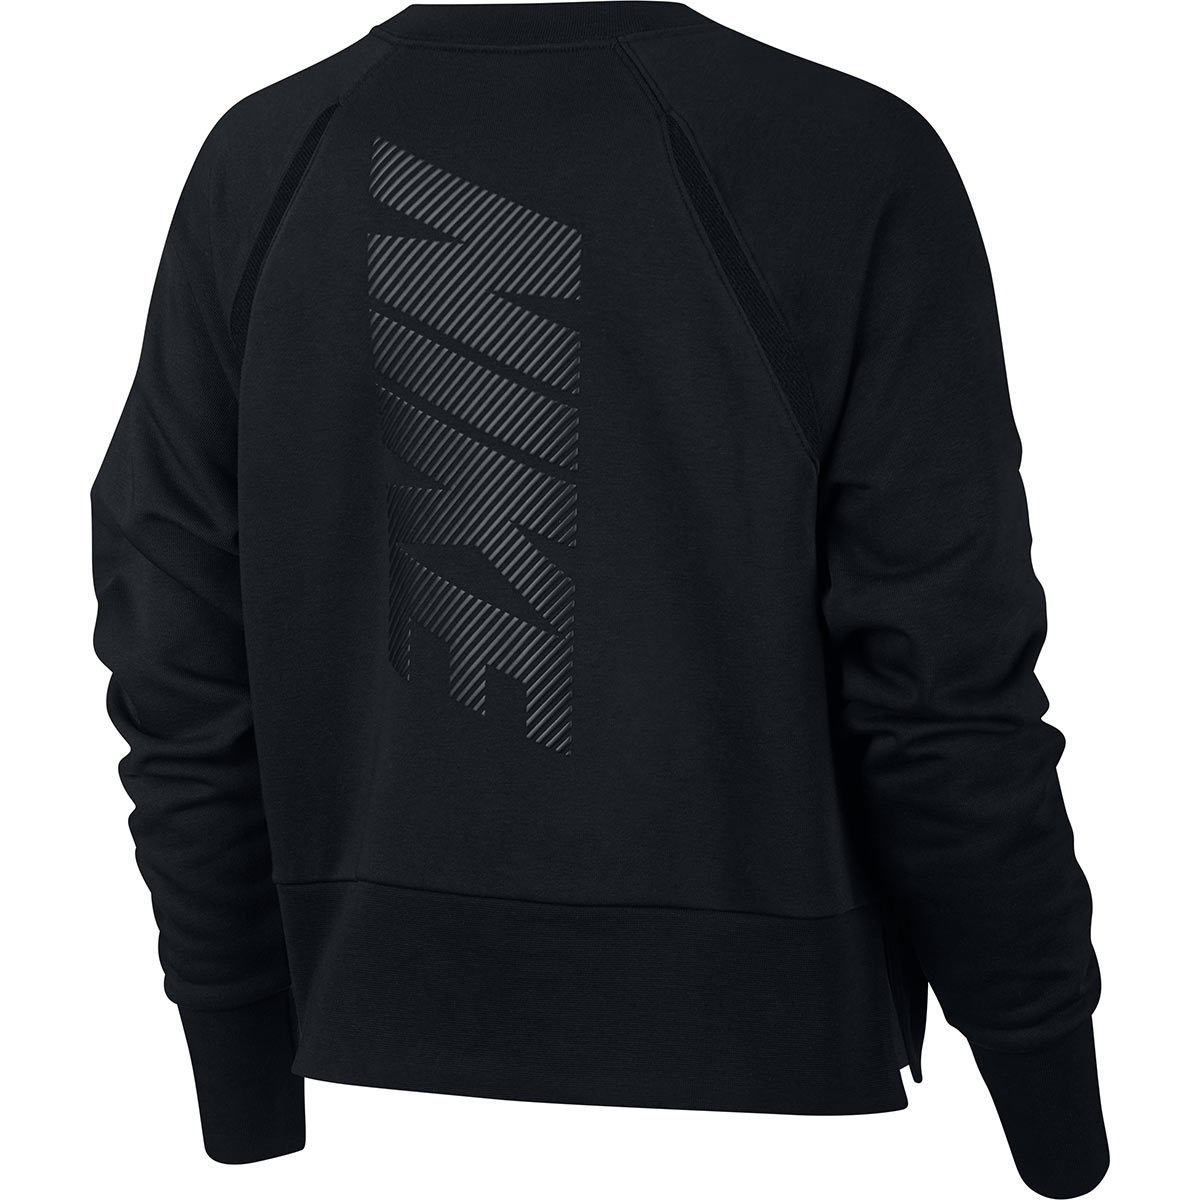 8329bc8ba5a2a ... Nike Womens Long Sleeved Training Top Black - Back